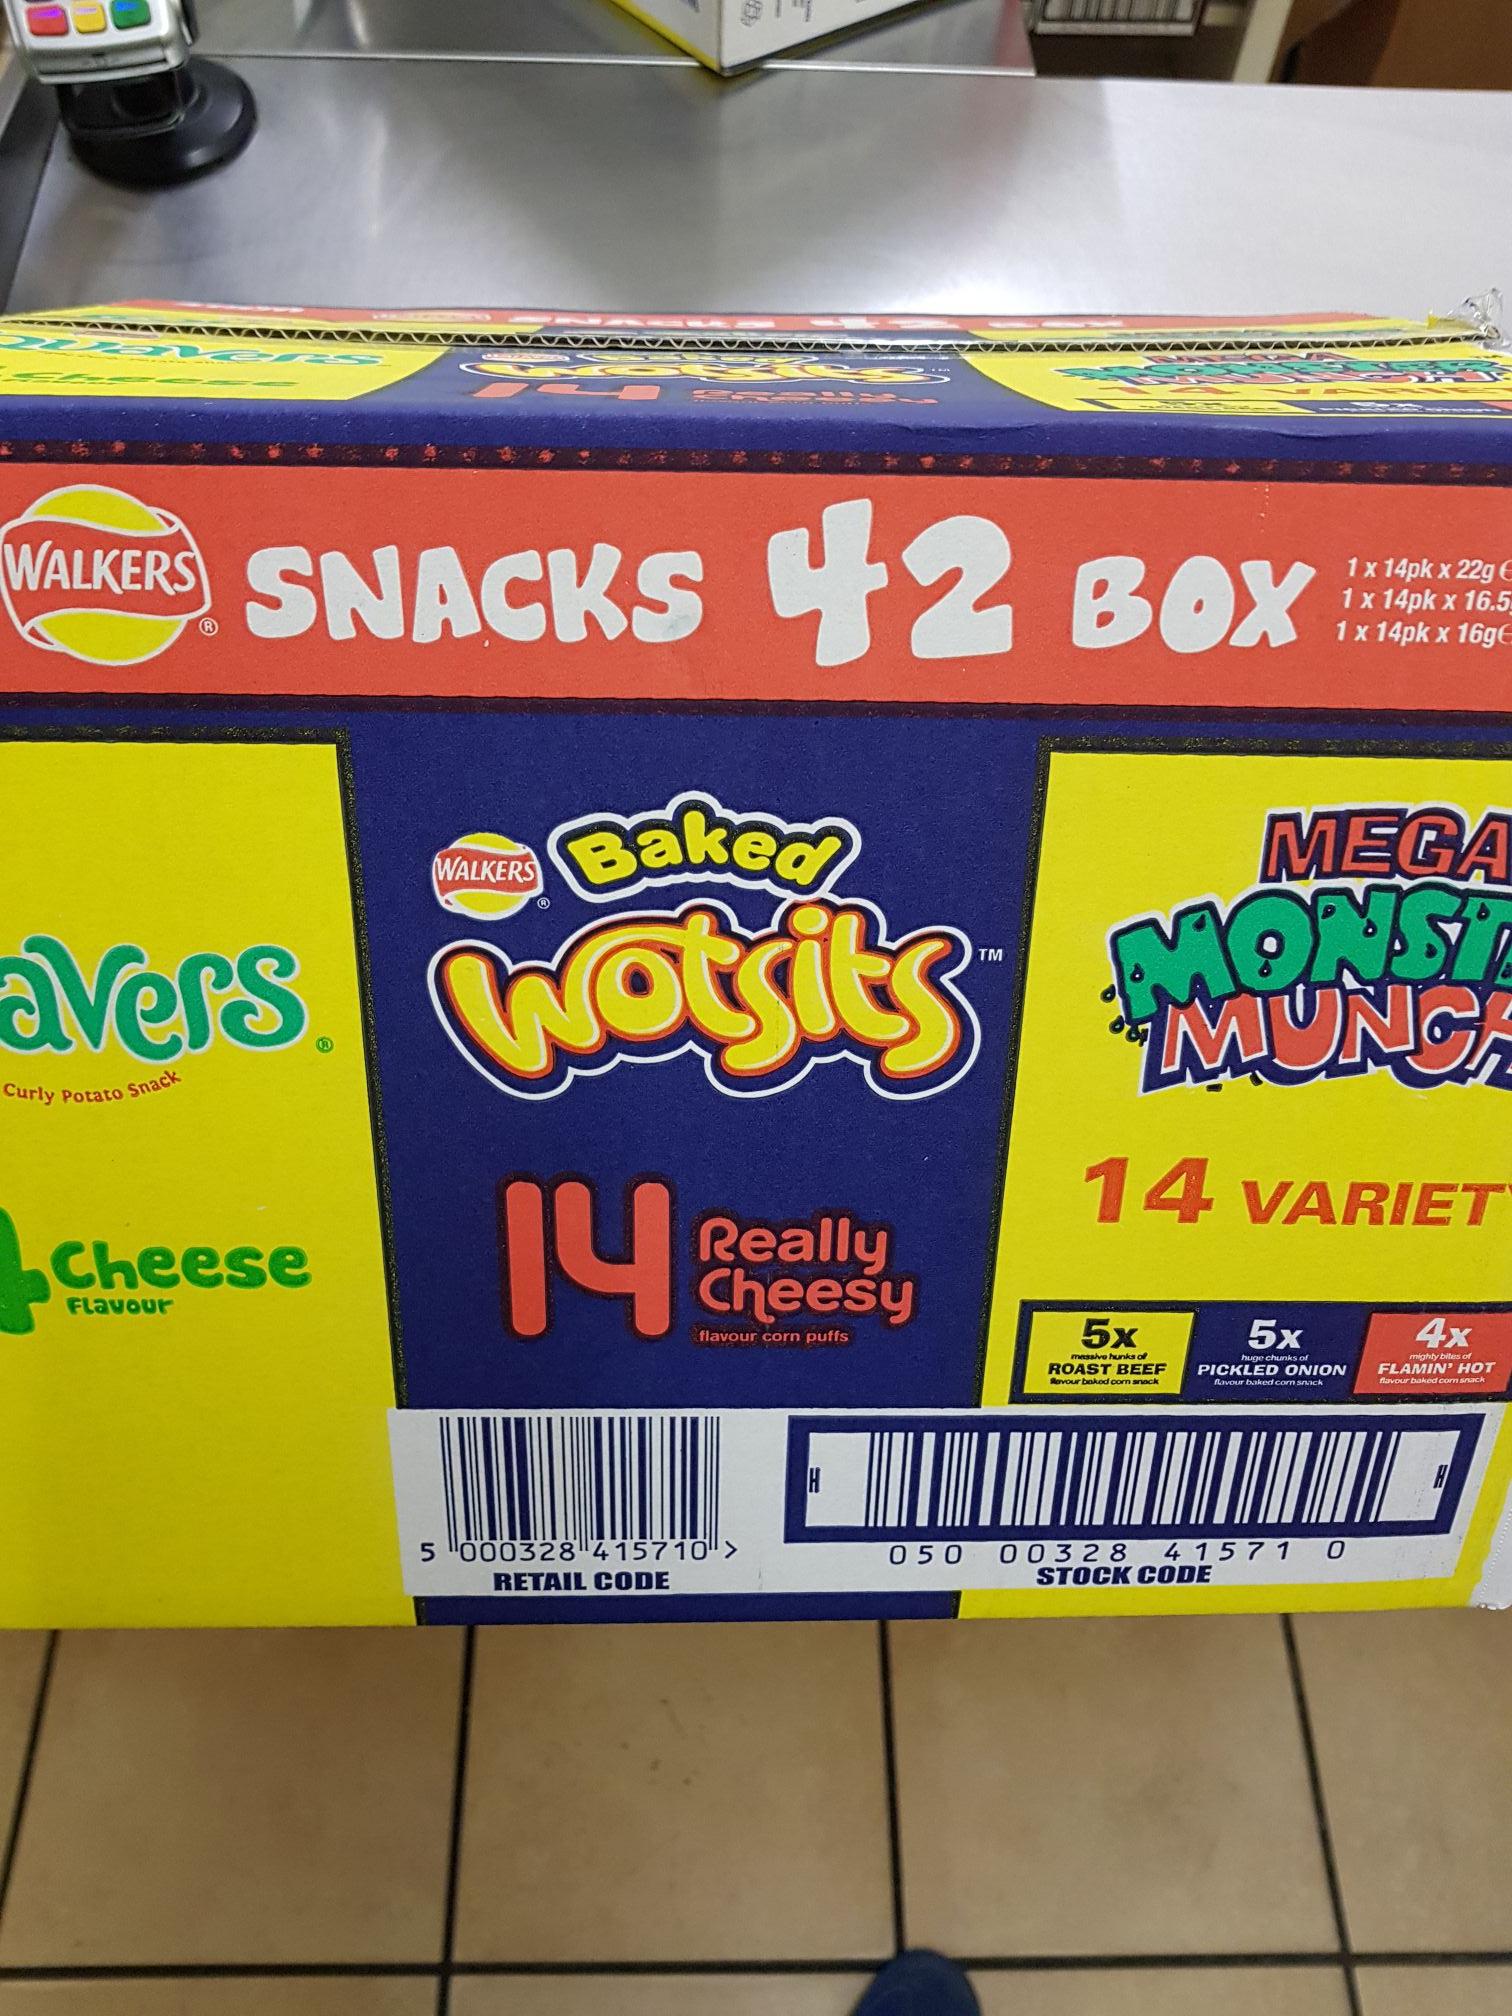 Box of 42 walkers crisps £2.99 @ farmfoods